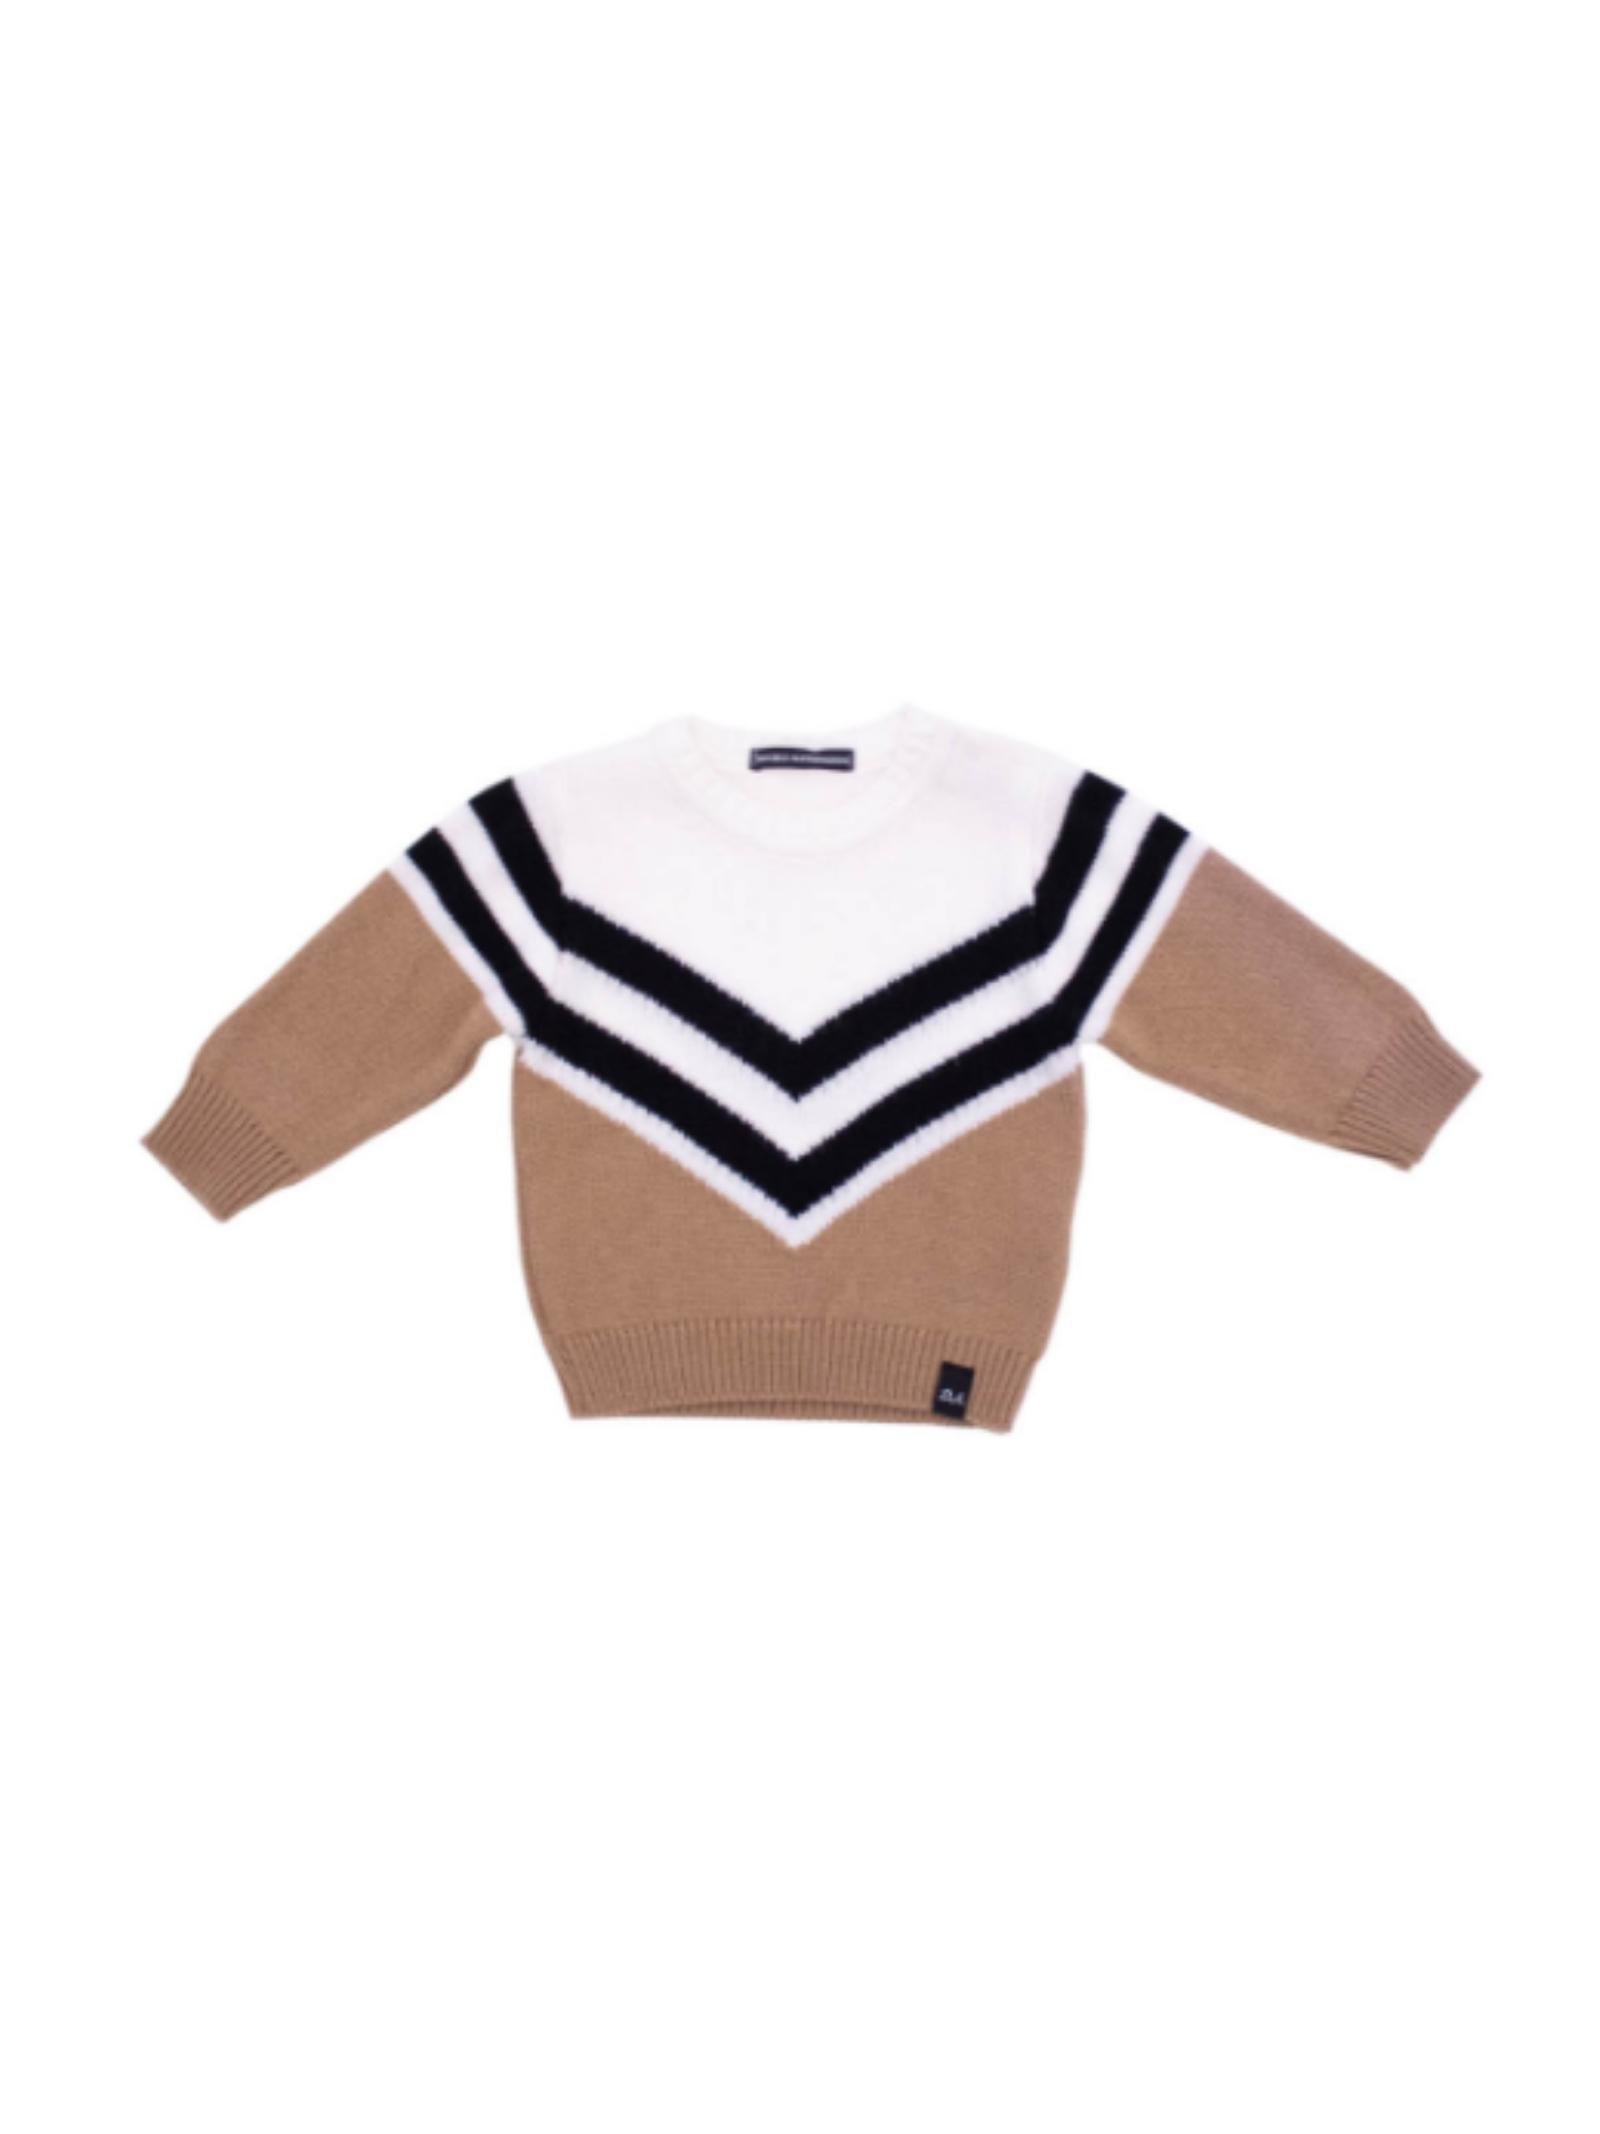 Basic Baby Sweater DANIELE ALESSANDRINI JUNIOR |  | 1291W0655CAMMELLO